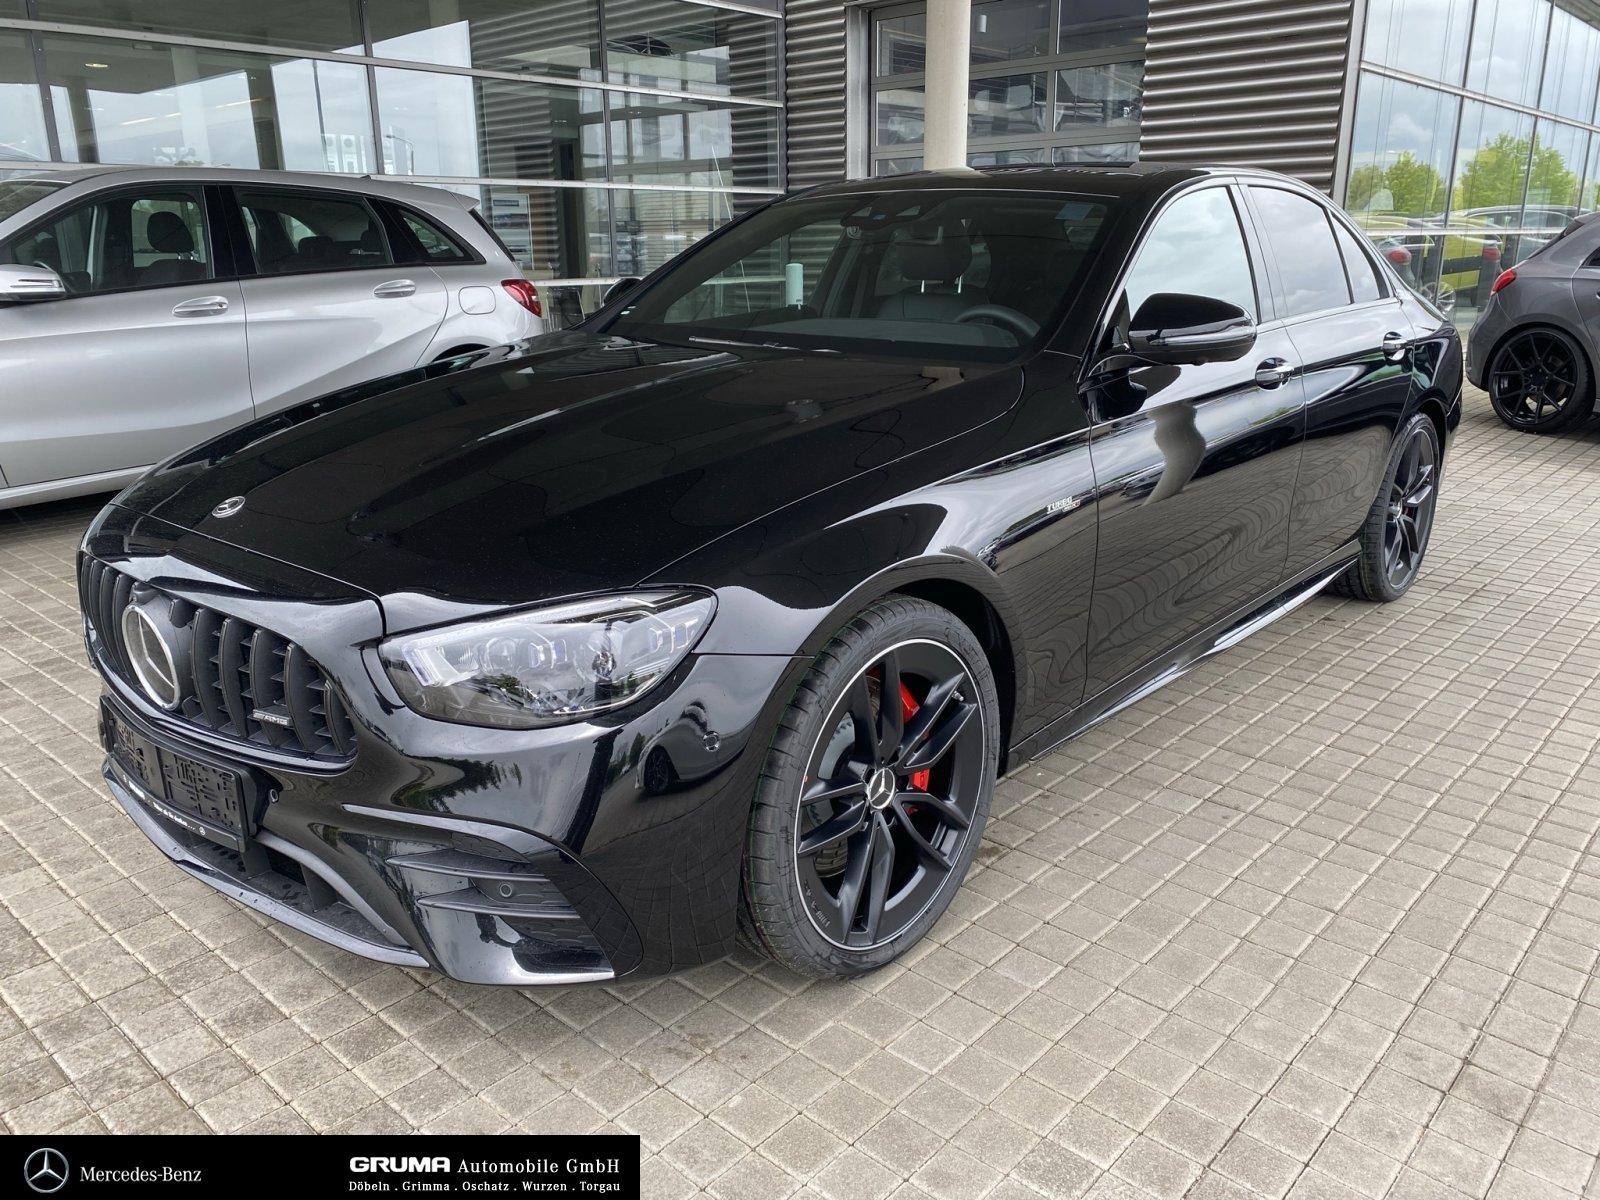 Mercedes-Benz Mercedes-AMG E 53 4MATIC+ Limousine 4M+ Navi/LED, Jahr 2021, Benzin